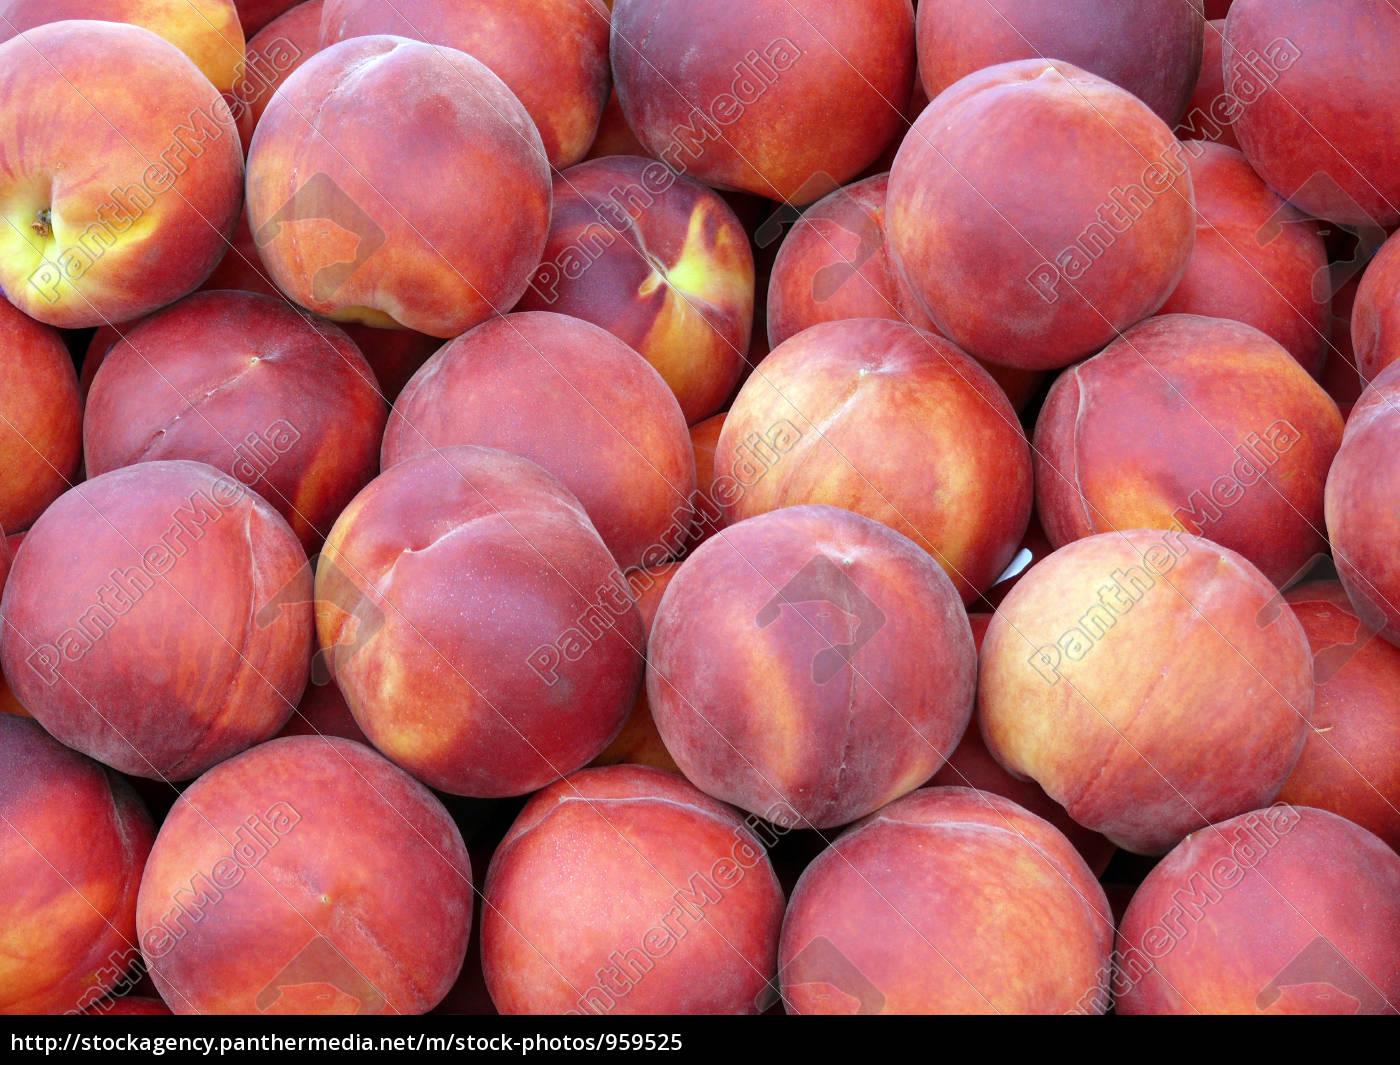 persian, apple - 959525